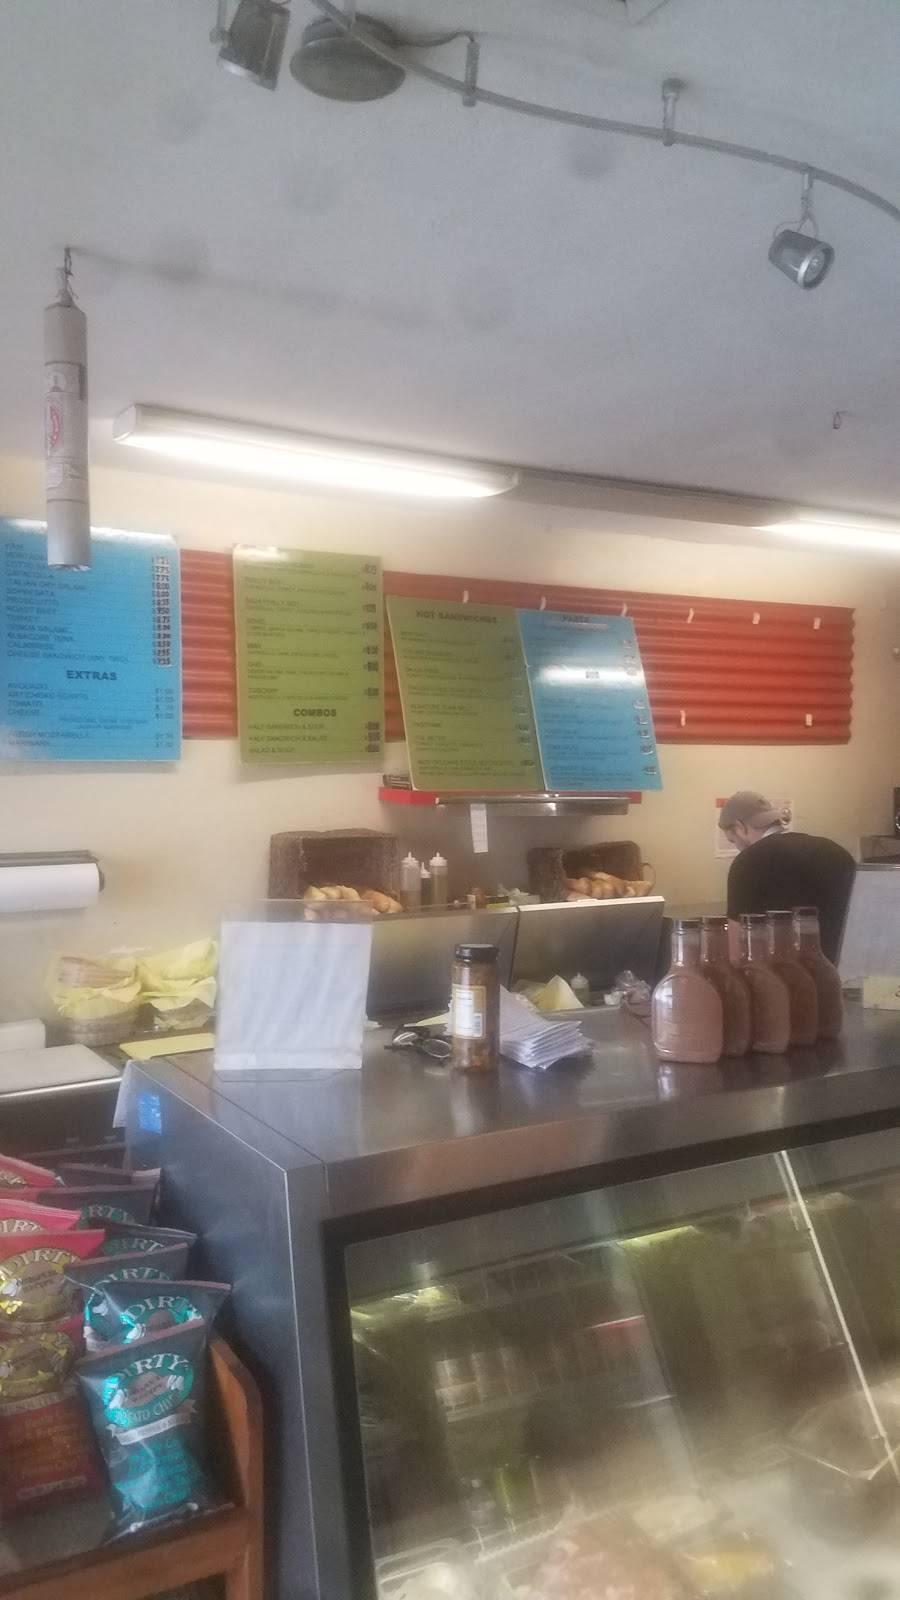 BMH Italian - restaurant  | Photo 5 of 9 | Address: 7670 El Cajon Blvd, La Mesa, CA 91942, USA | Phone: (619) 698-6333